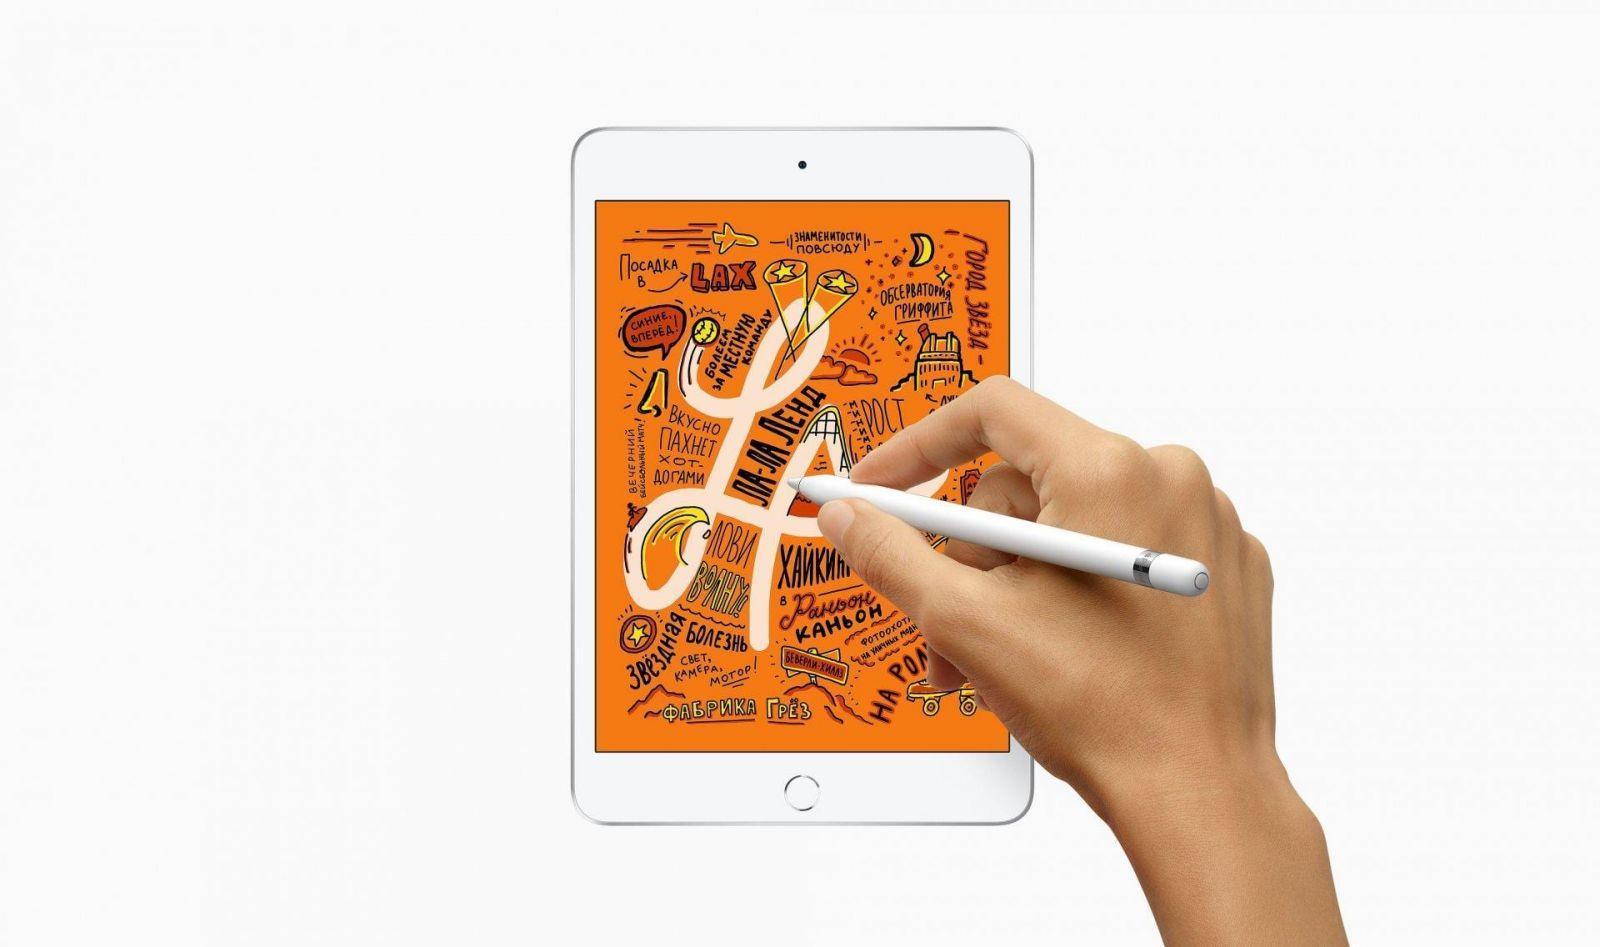 Apple неожиданно представила новый iPad Air и iPad mini c процессором A12 (ipad mini gallery 1 geo ru)